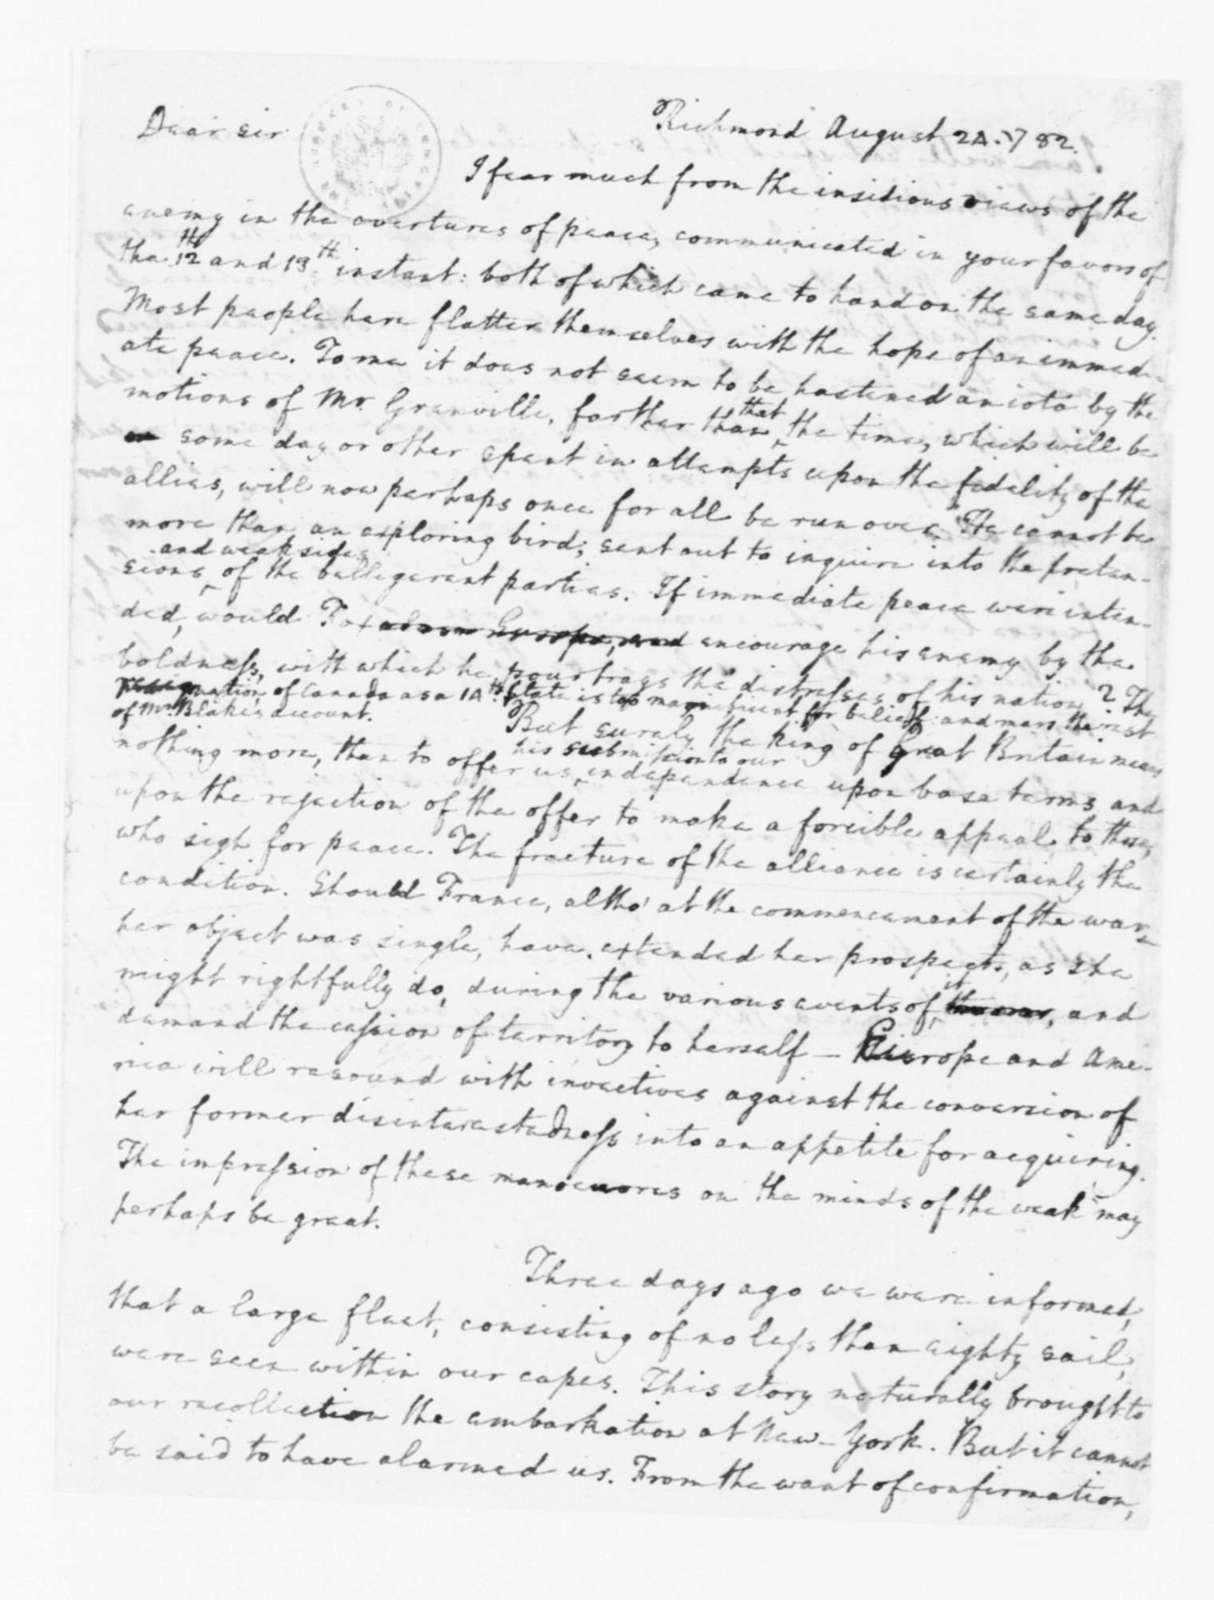 Edmund Randolph to James Madison, August 24, 1782.